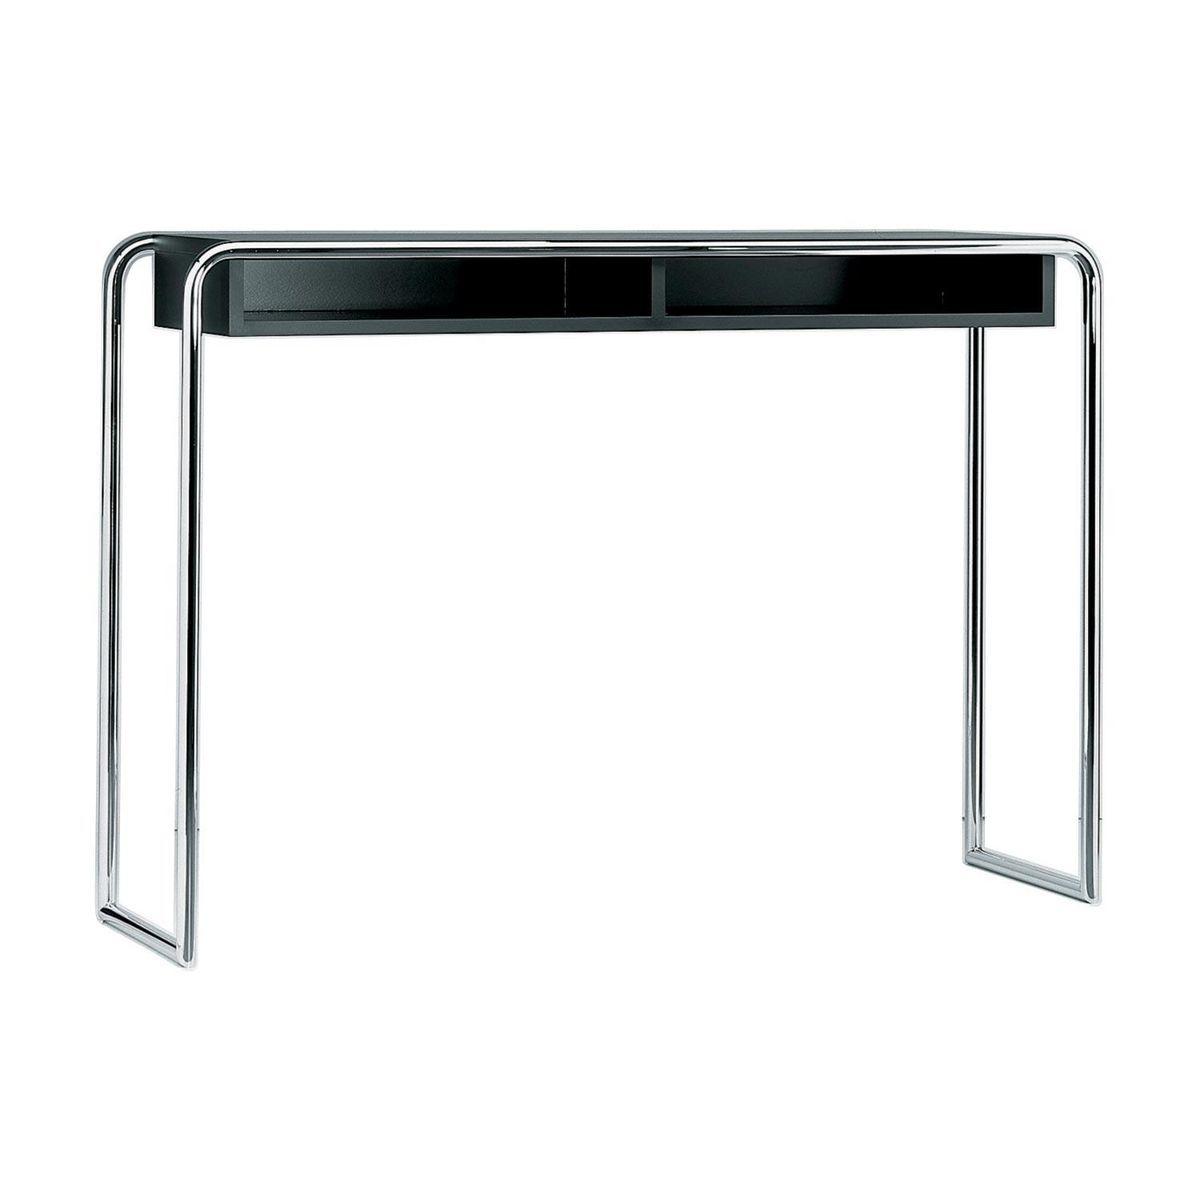 thonet b 108 konsolentisch thonet. Black Bedroom Furniture Sets. Home Design Ideas